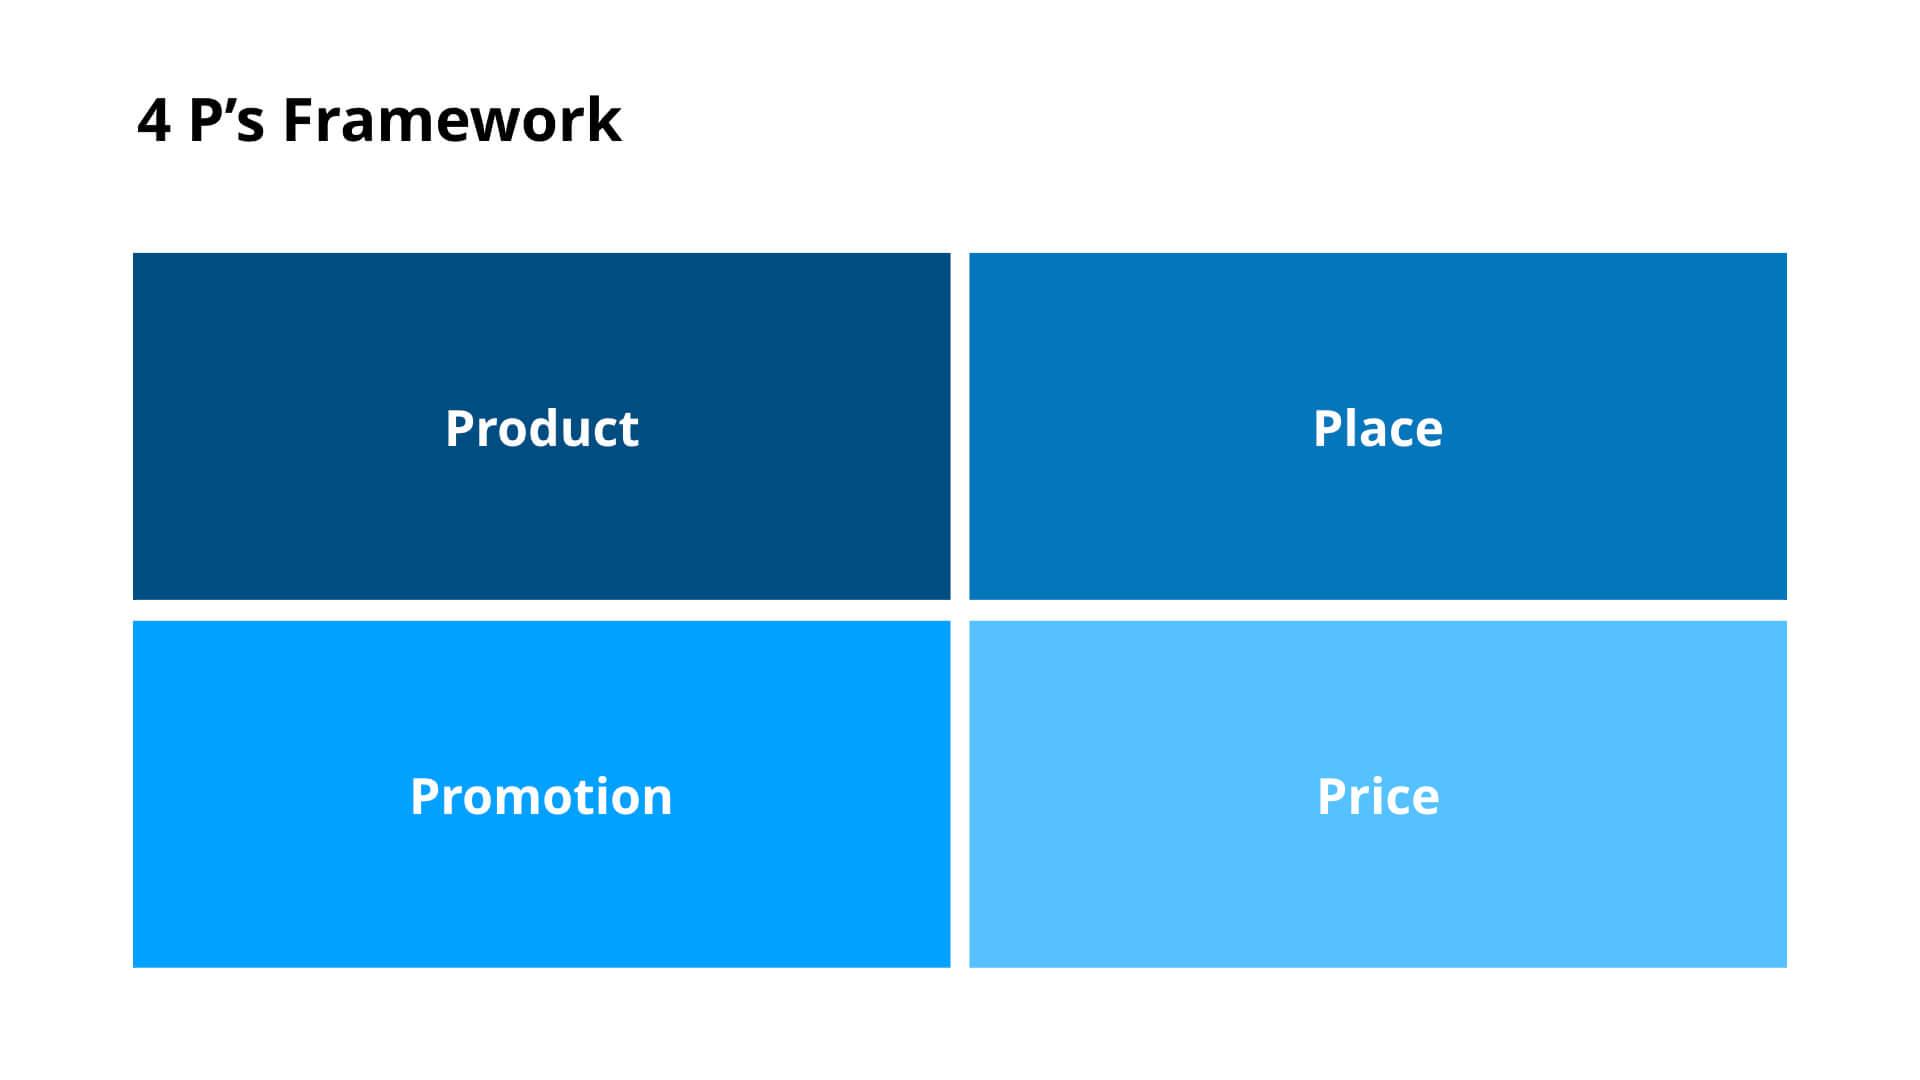 4 P's Framework